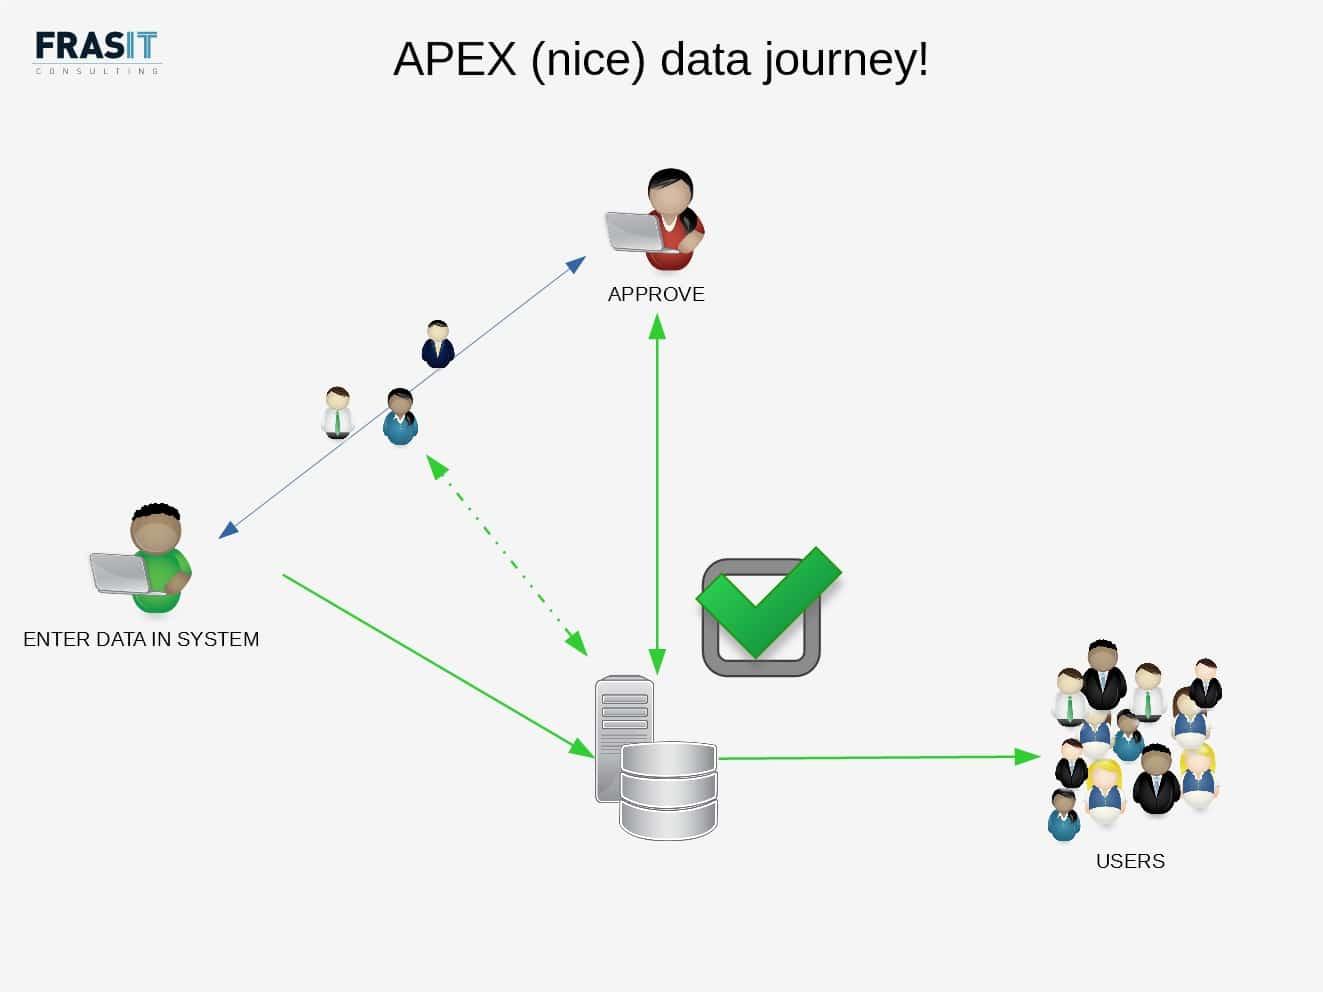 Optimized data journey